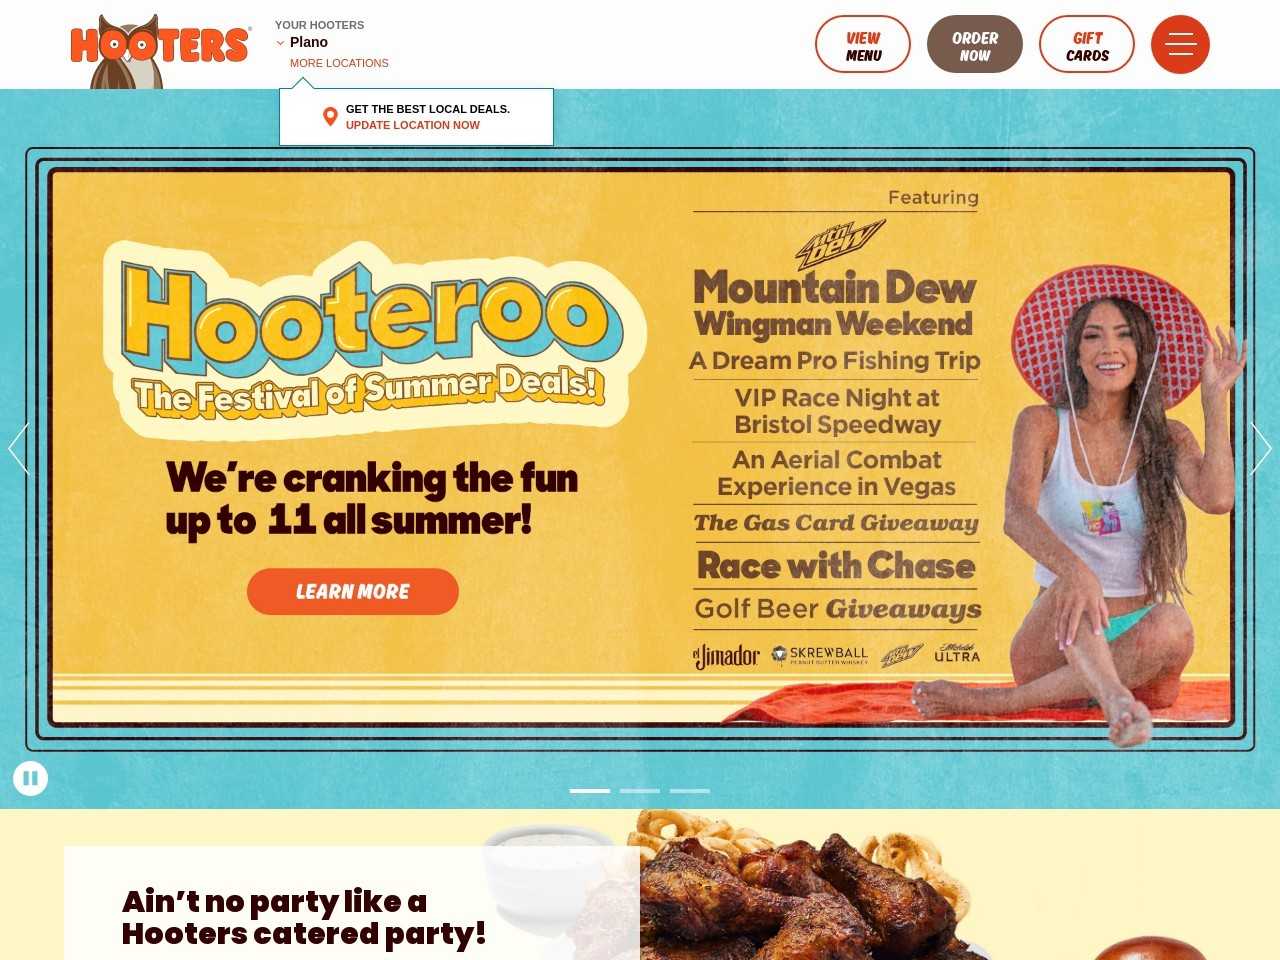 hooters.com